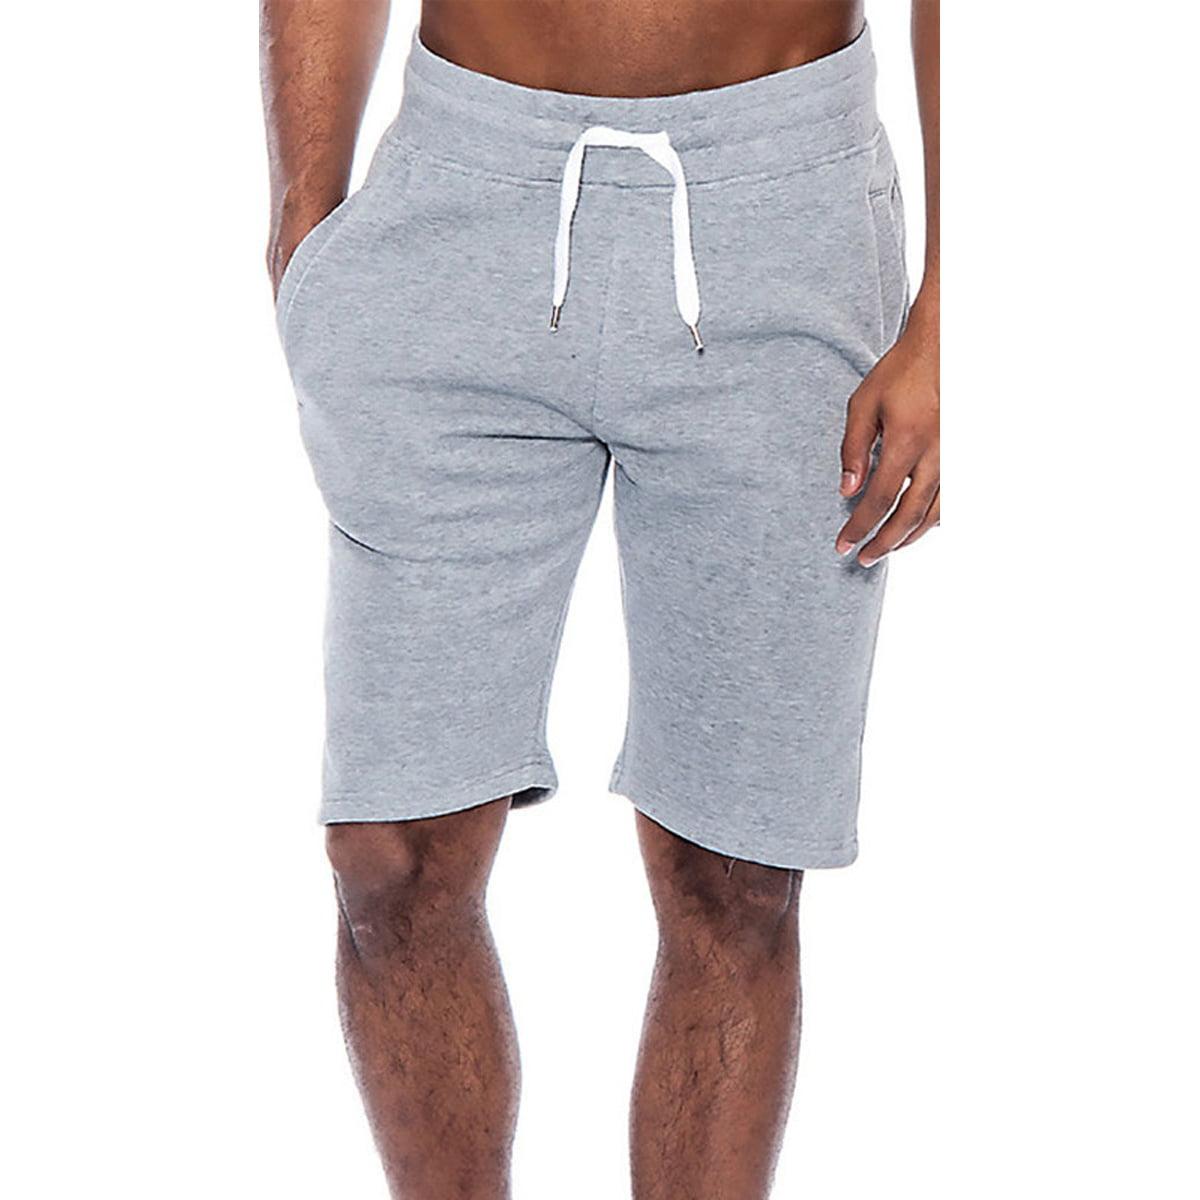 Summer Men/'s Casual Comfy Shorts Baggy Gym Sport Jogger Sweat Drawstring Pants